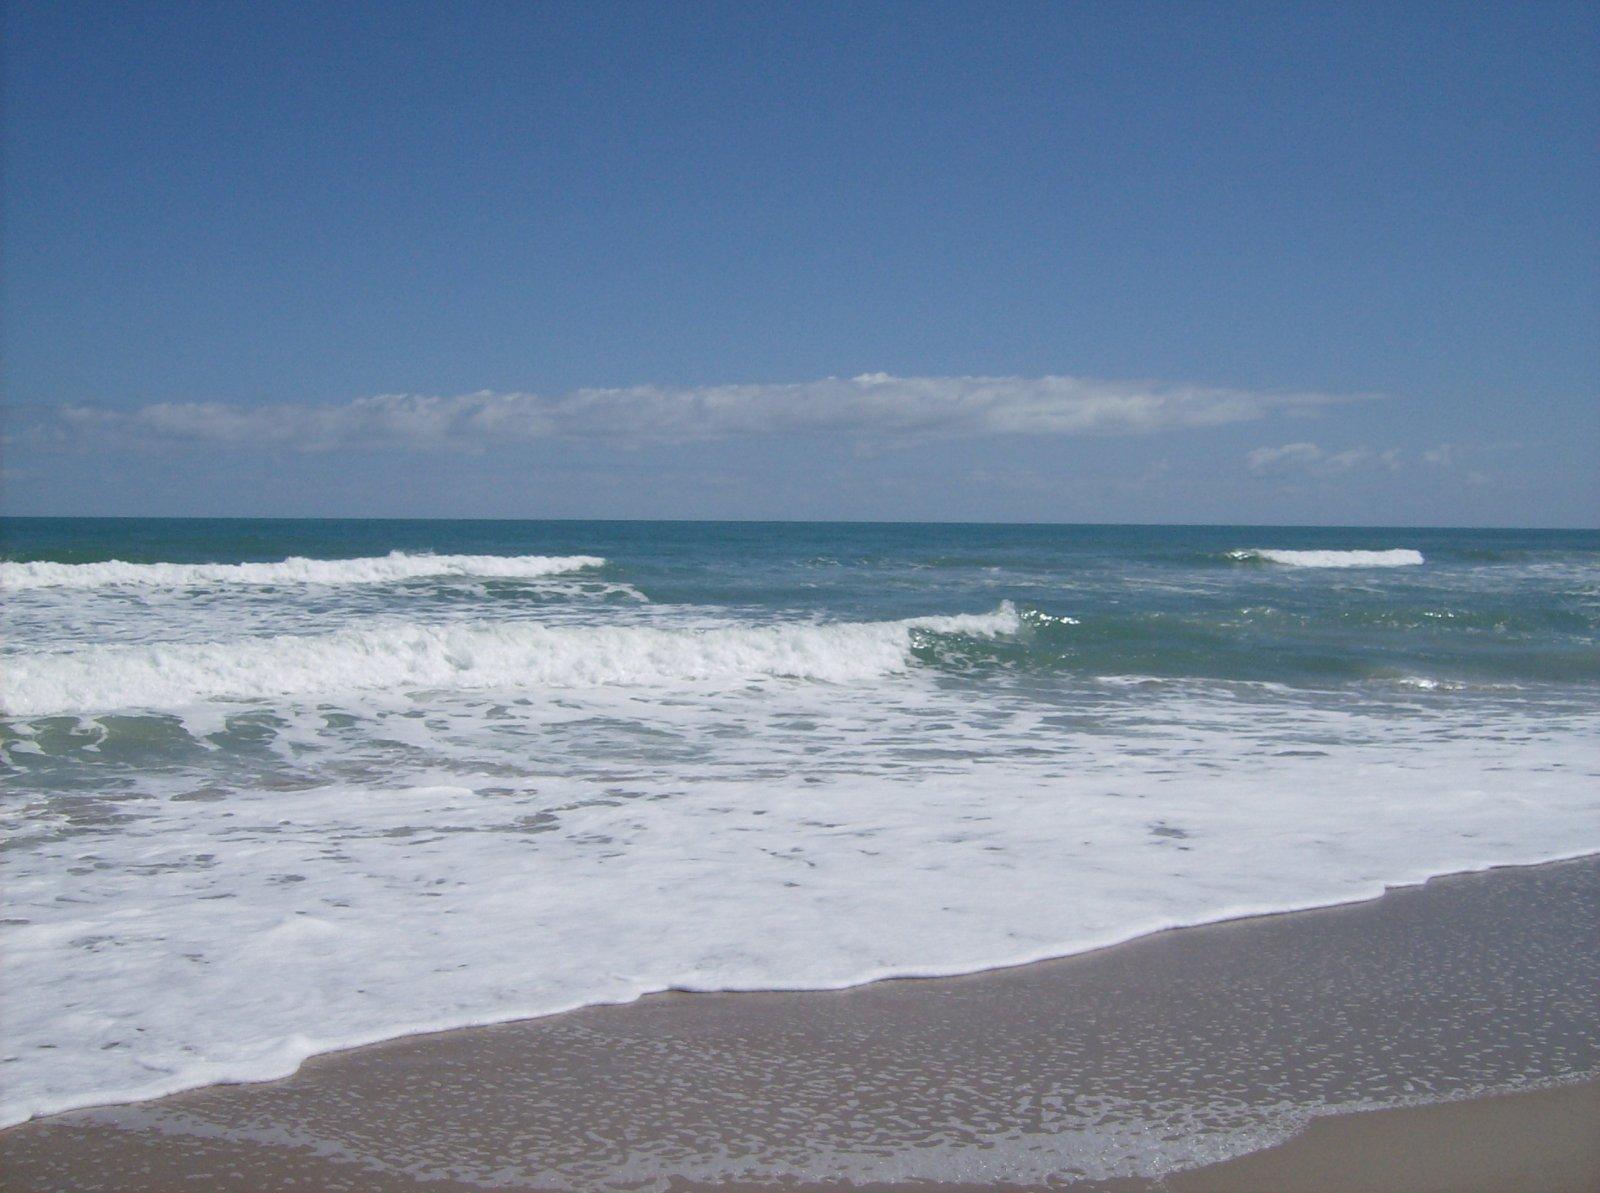 Click image for larger version  Name:Playalina Beach & Florida Gators 002.jpg Views:88 Size:215.6 KB ID:153342